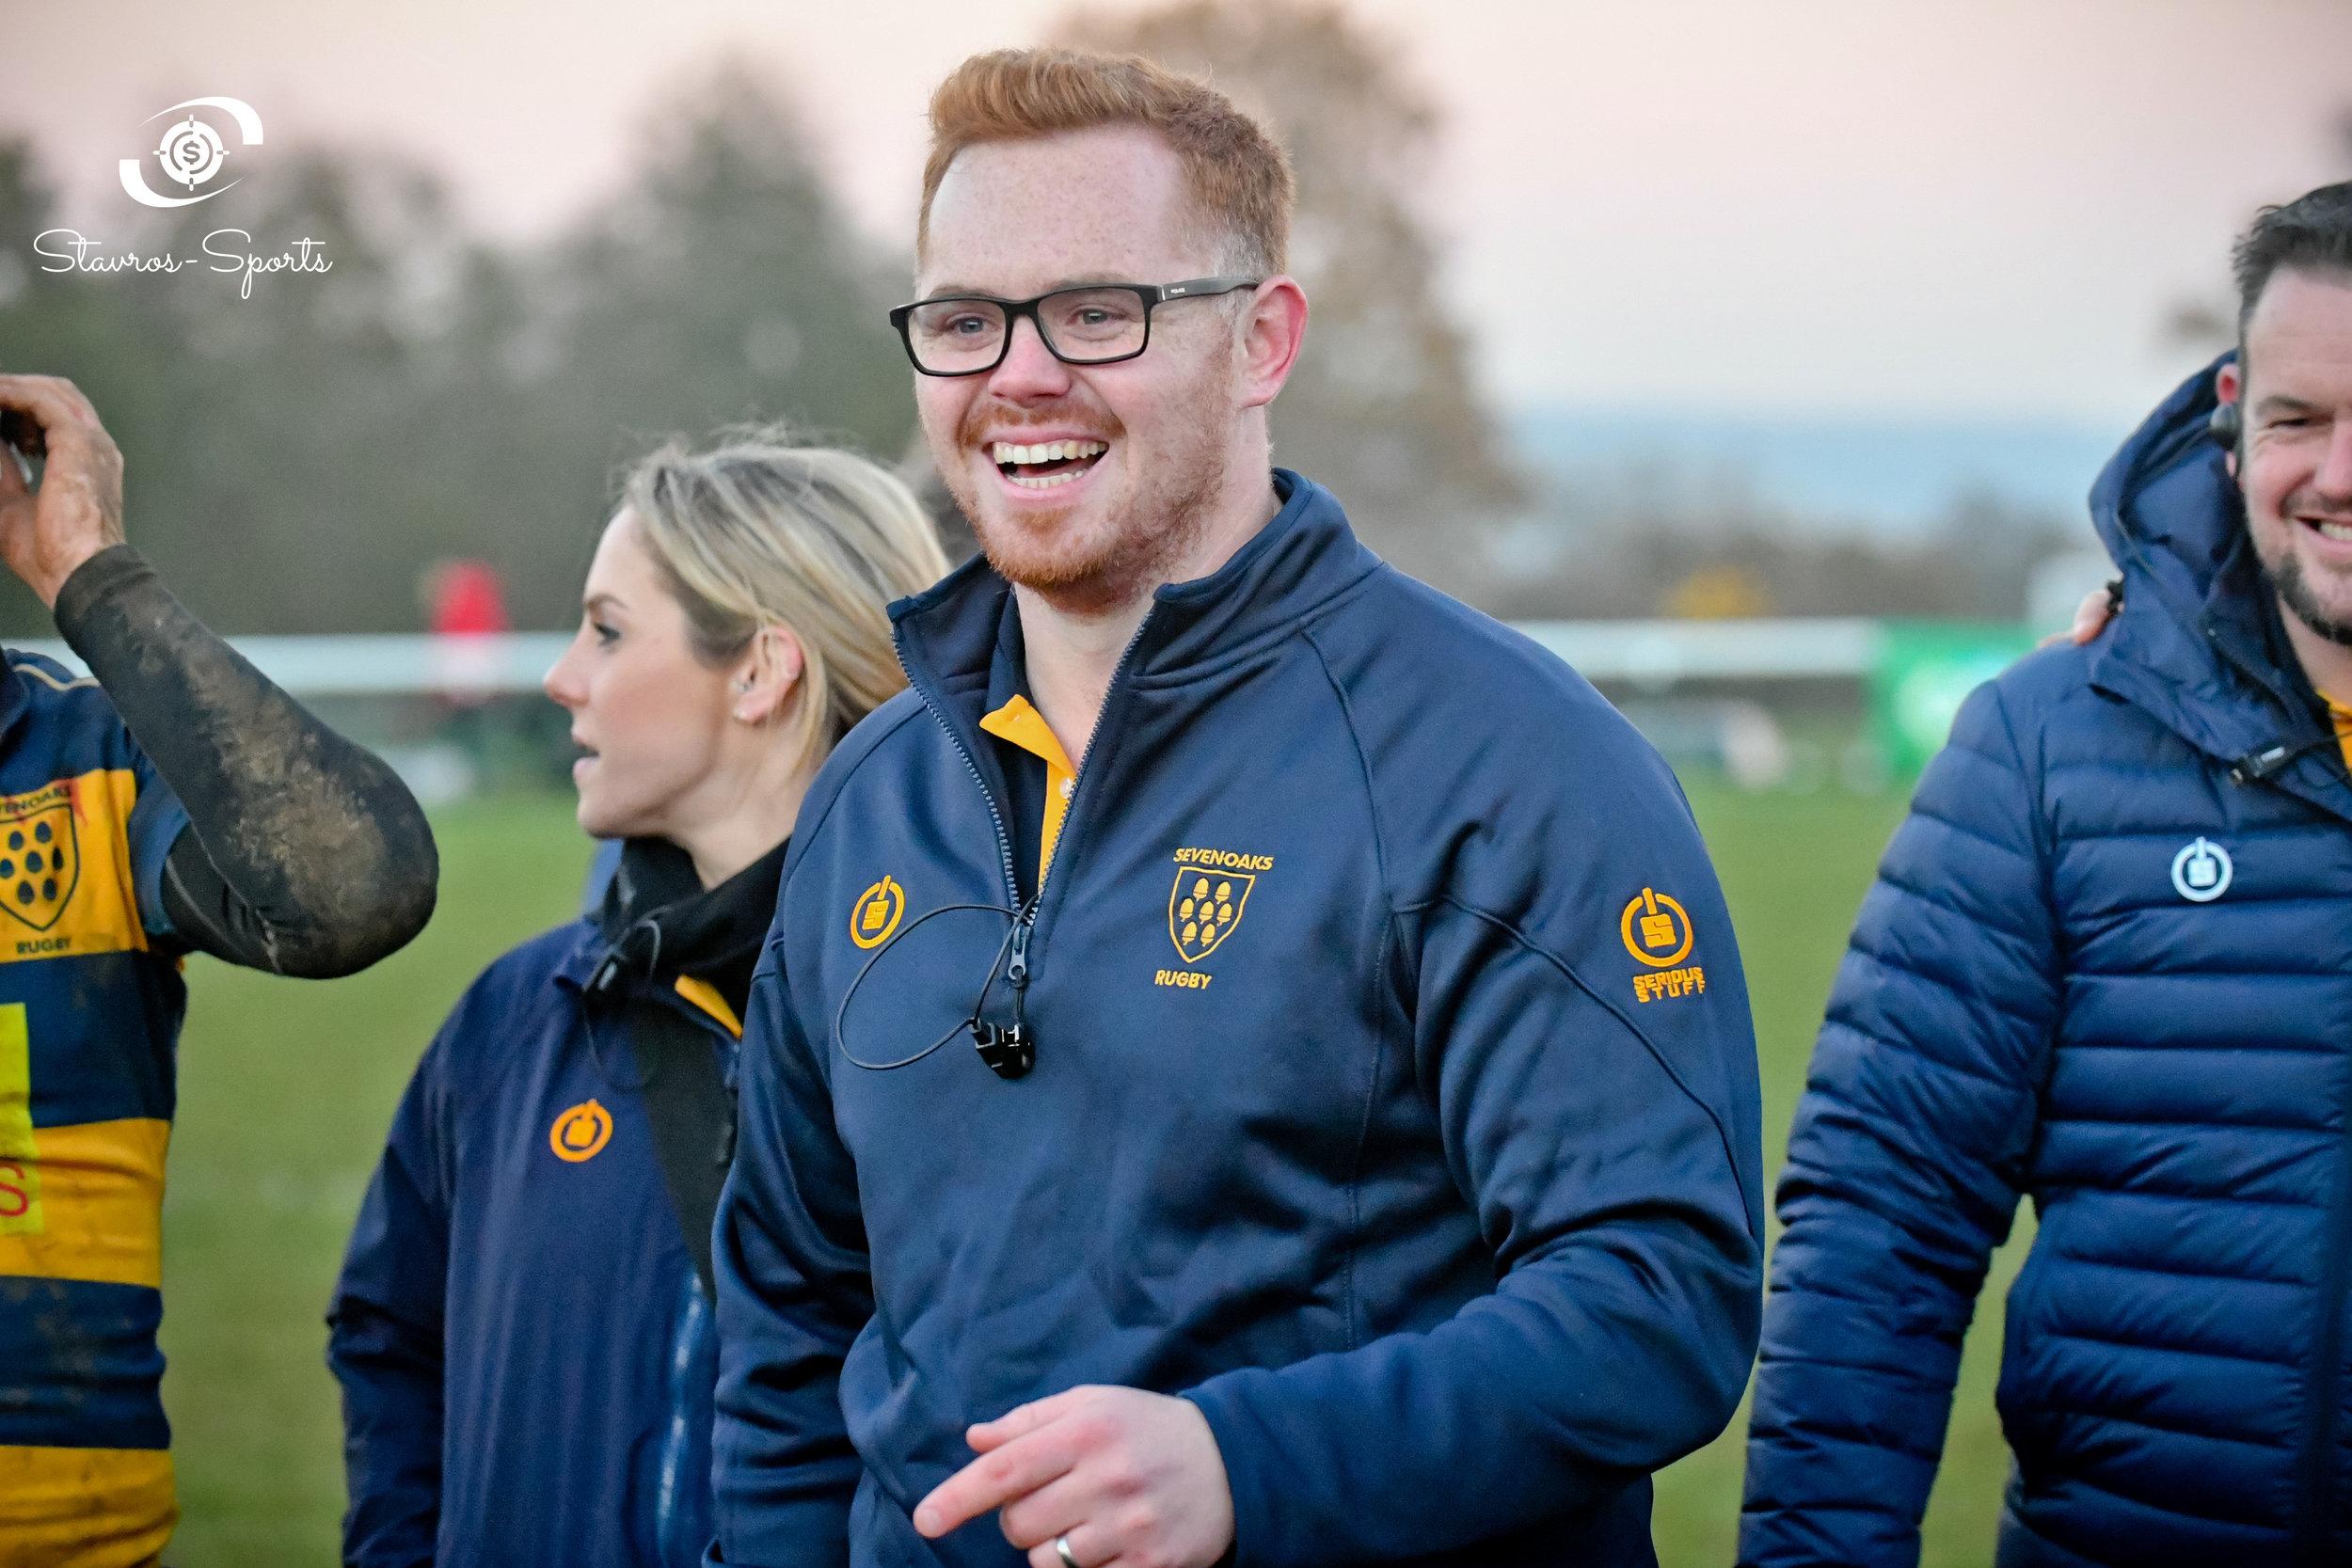 Oaks Head Coach Adam Bowman is a happy man going into 2019. Photo Credit: David Purday